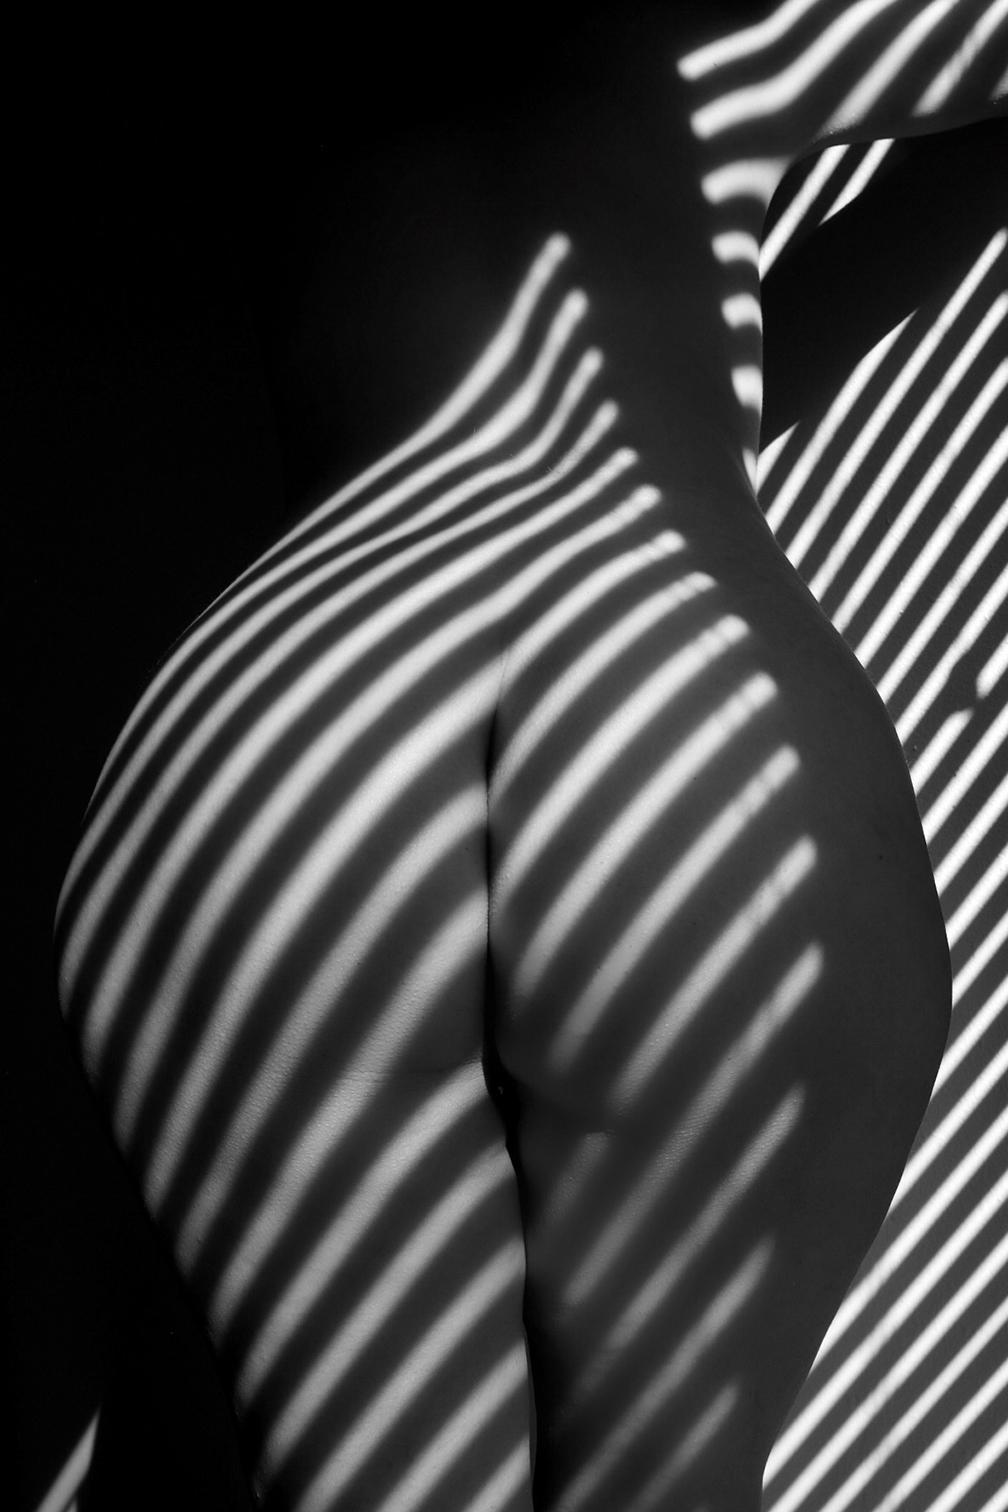 Savannah Spirit End of an Era (Black and White Nude Photography B&W)